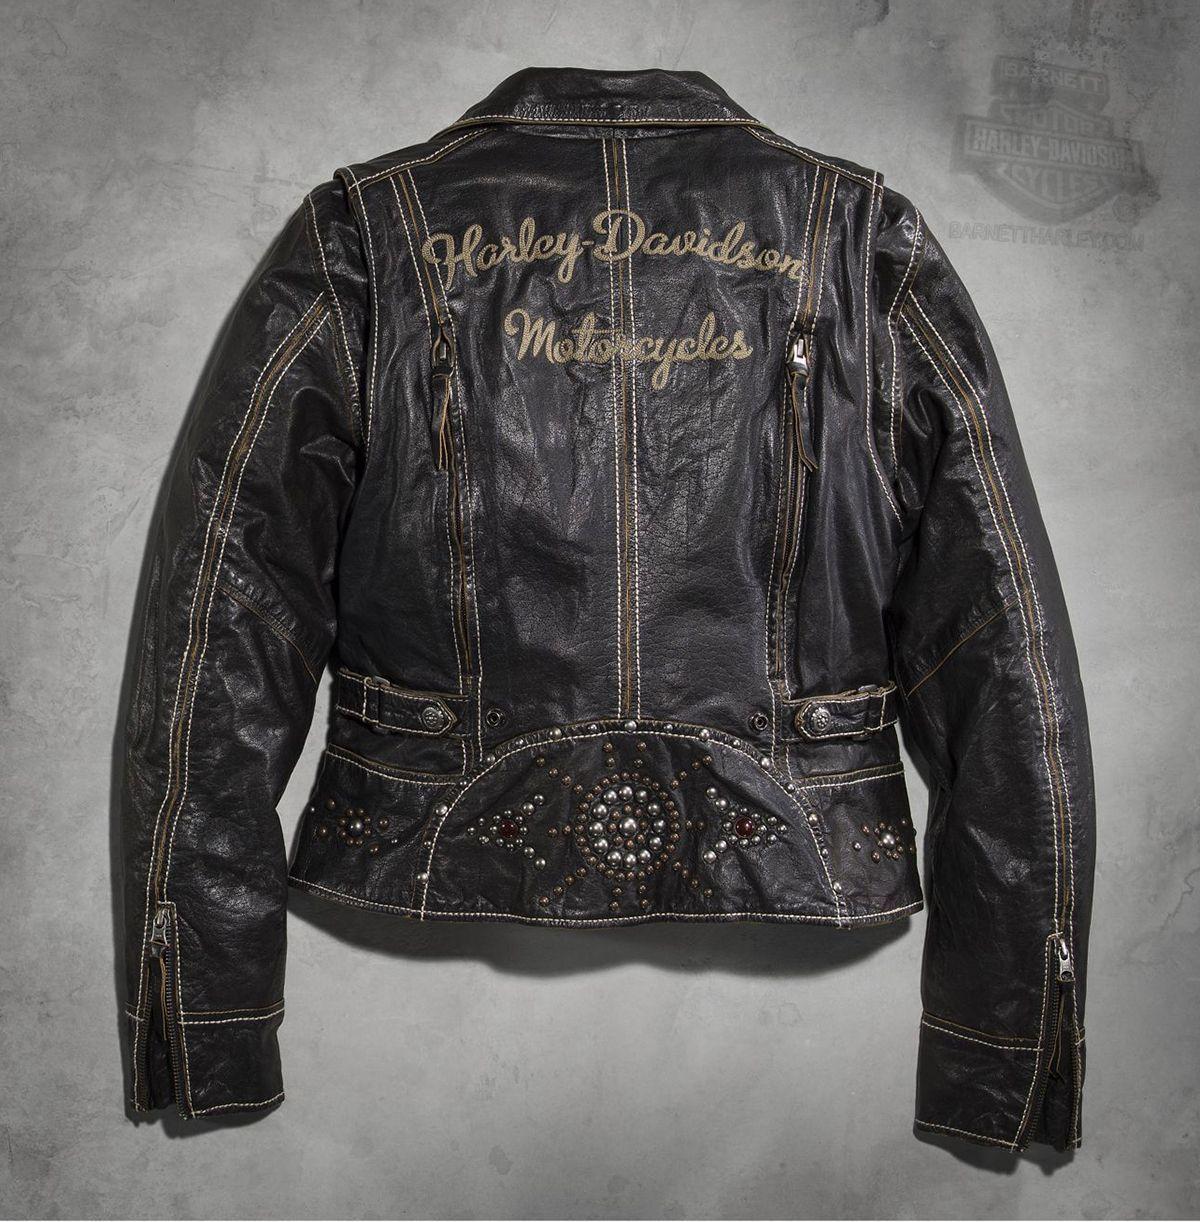 Harley Davidson 97112 16vw Harley Davidson Womens Panorama Biker With Stud Jewel Design Black Leather J Harley Jacket Biker Outfit Black Leather Jacket [ 1222 x 1200 Pixel ]